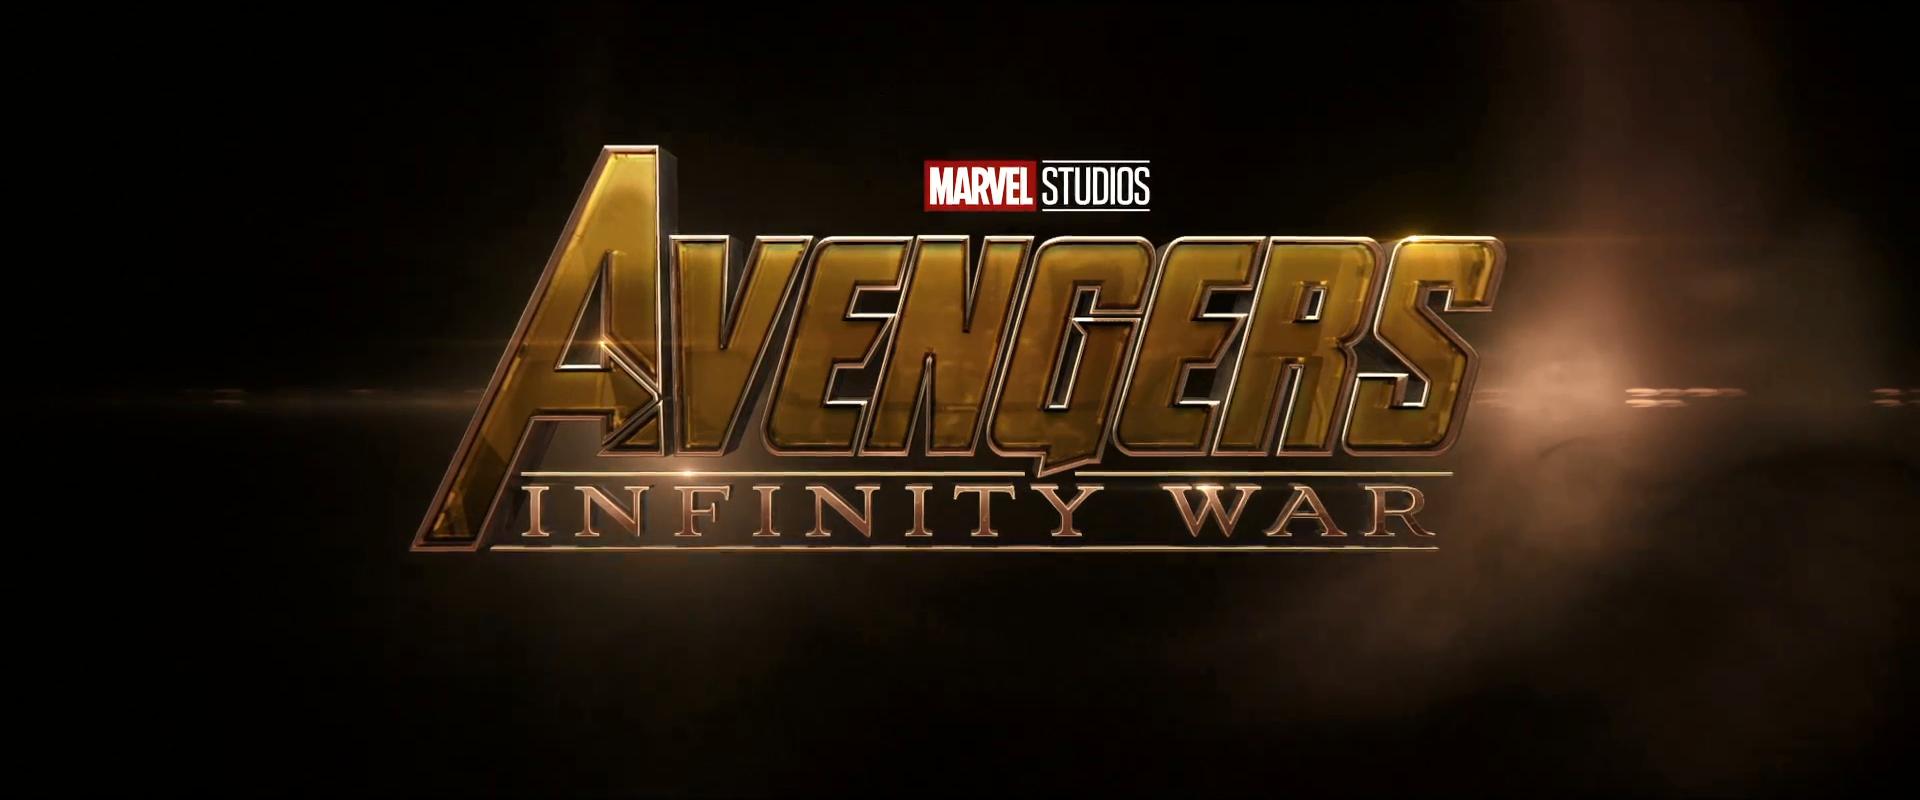 Avengers: Infinity War logotyp